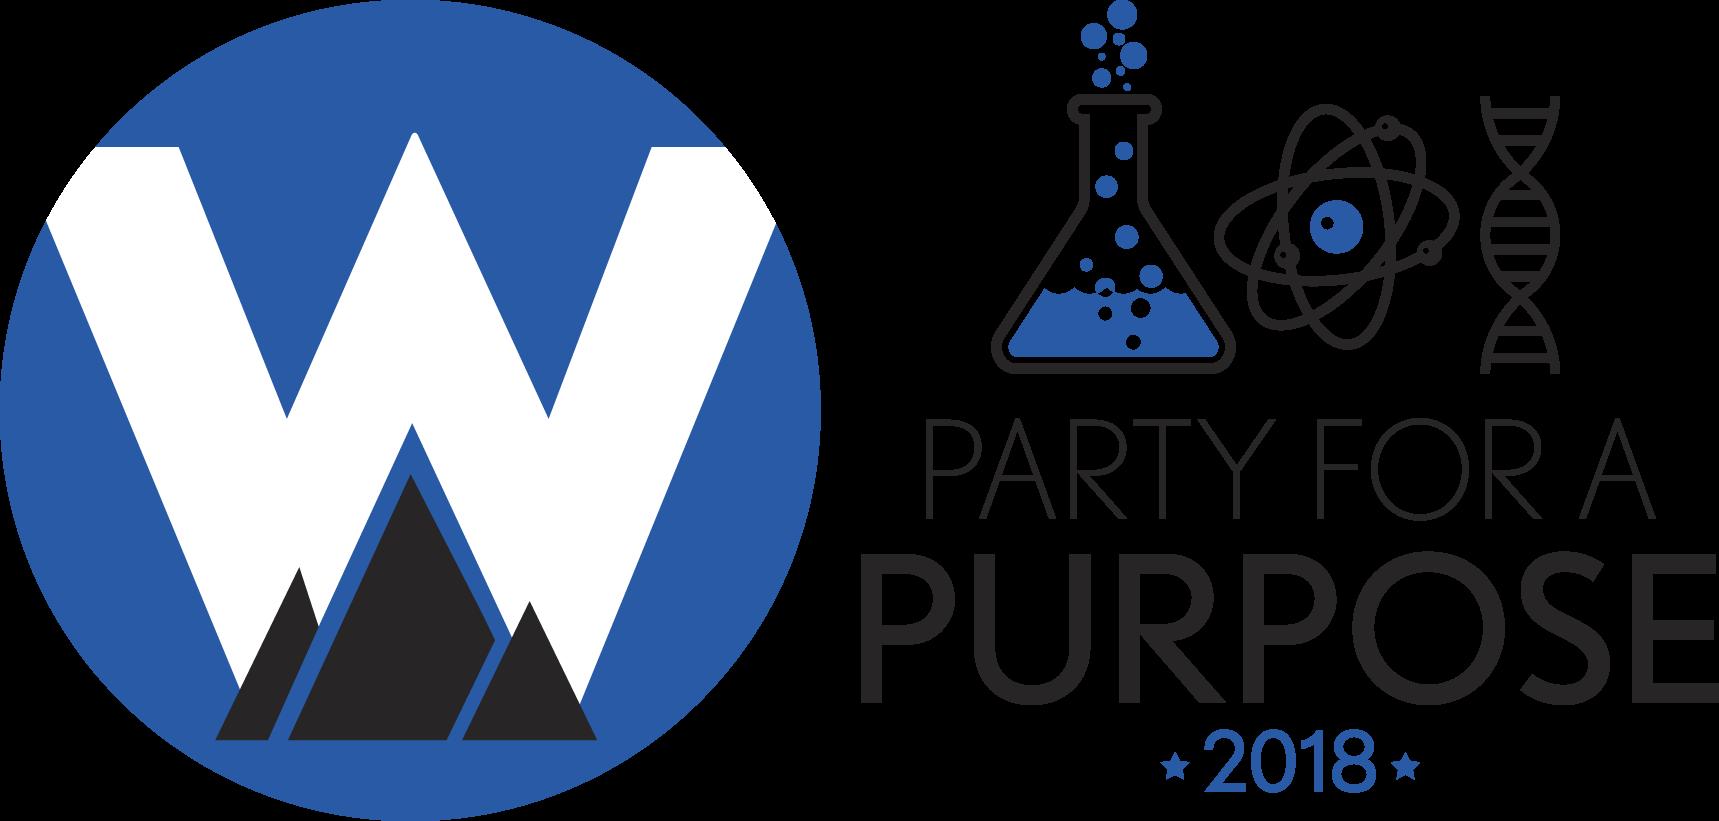 PartyForPurpose_2018_horizontal.png